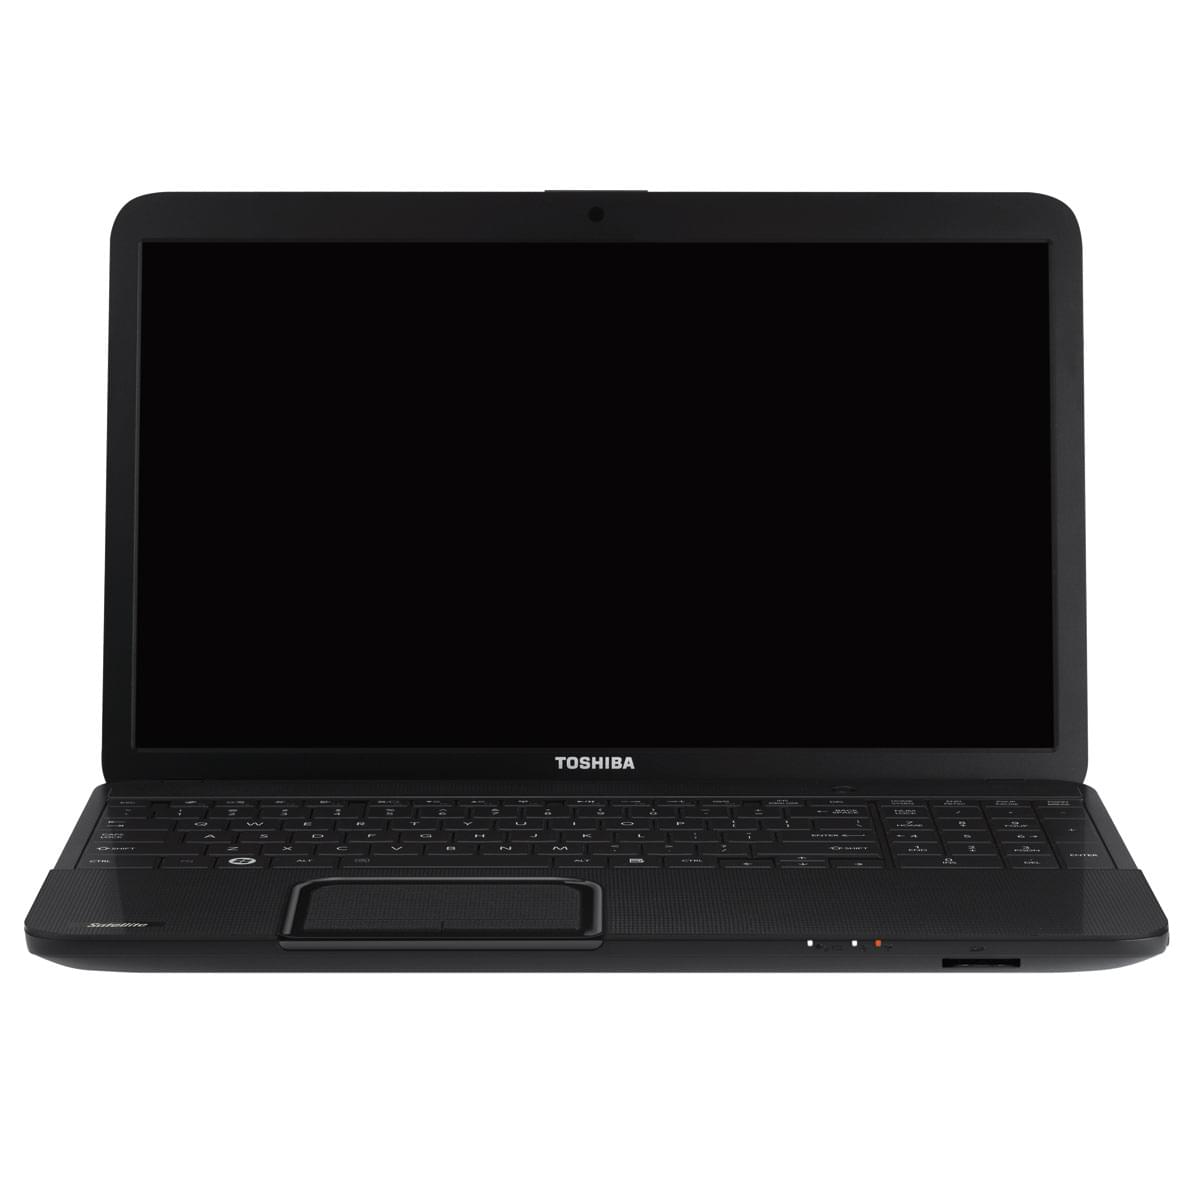 Toshiba PSCC2E-00800KFR - PC portable Toshiba - Cybertek.fr - 0